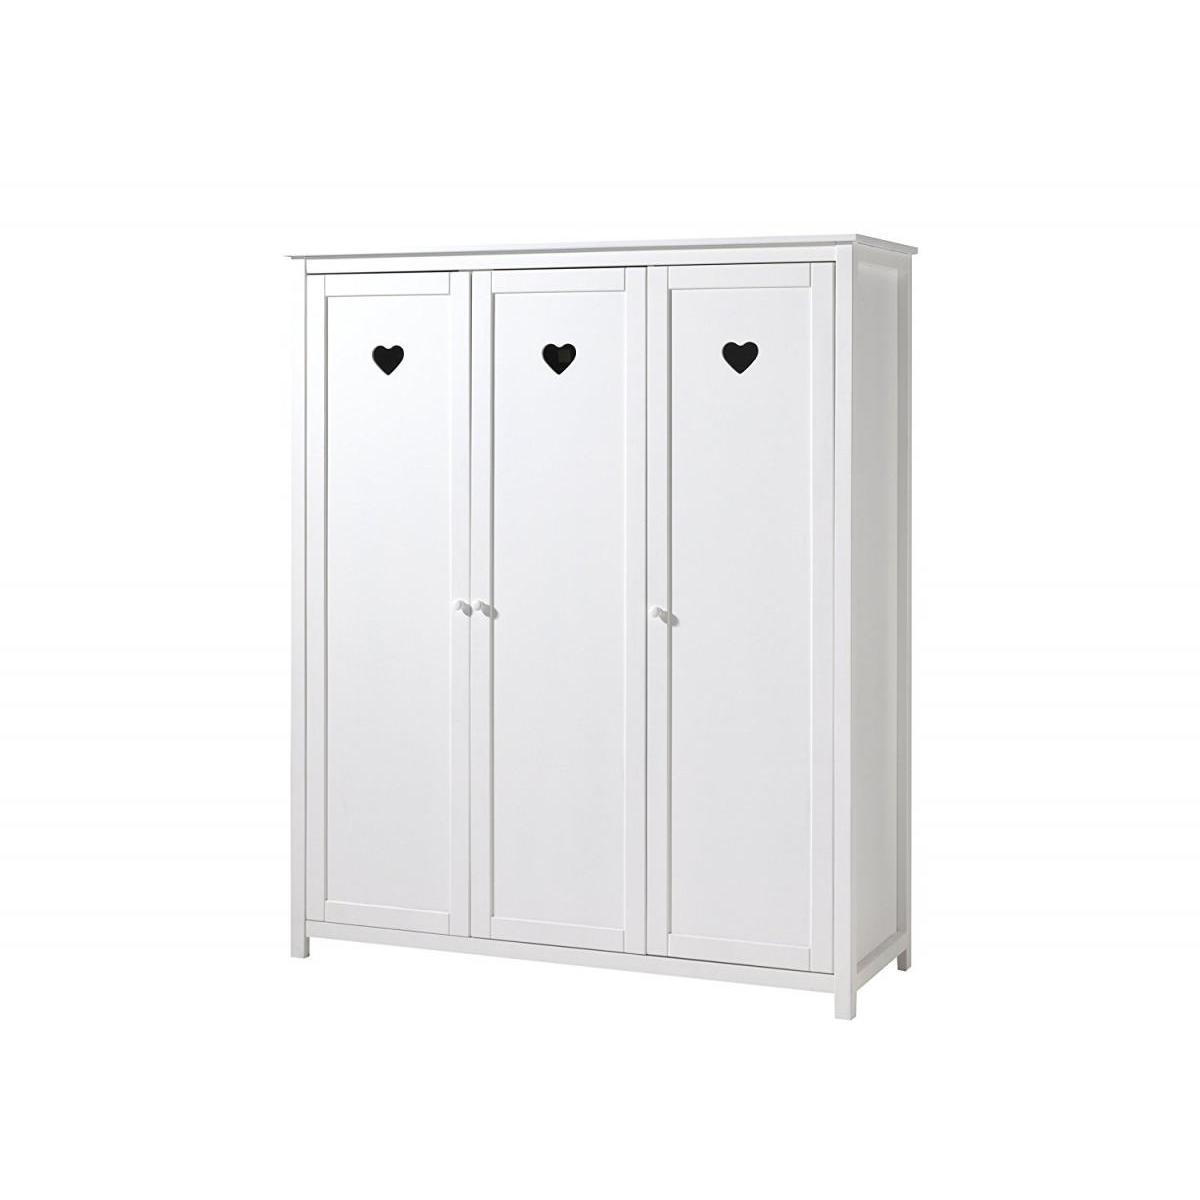 Vipack Vipack AMORI Armoire 3 portes laqué blanc